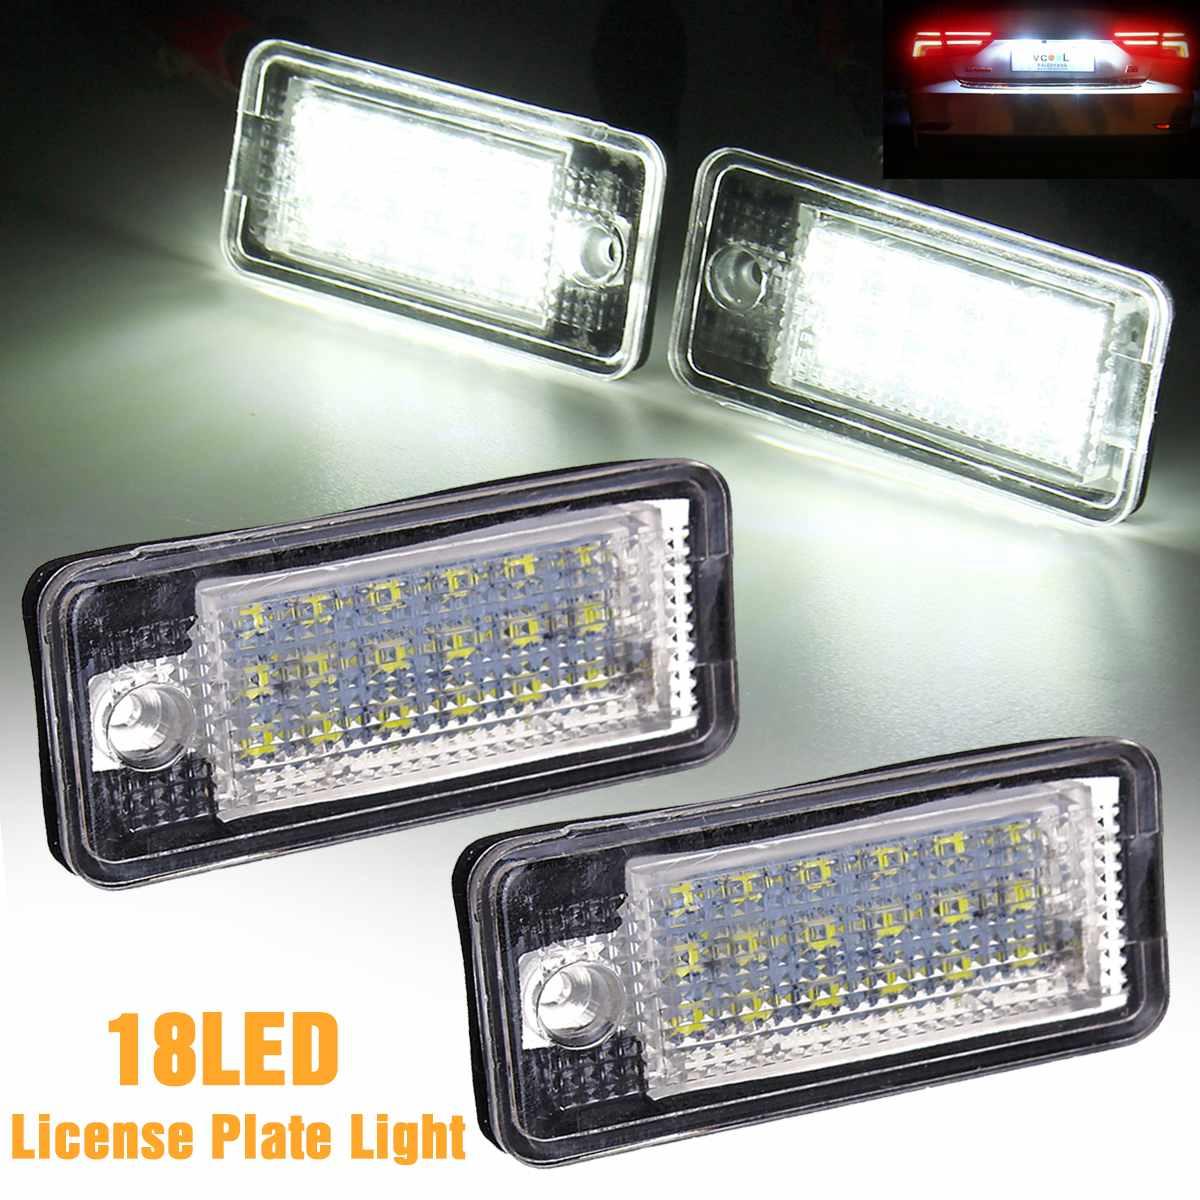 2X LED Number License Plate Light Lamp 8E0807430A 8E0807430B 8E0943021B 8E0943022B For Audi A4 S4 RS4 A3 S3 A6 C6 S6 RS6 A5